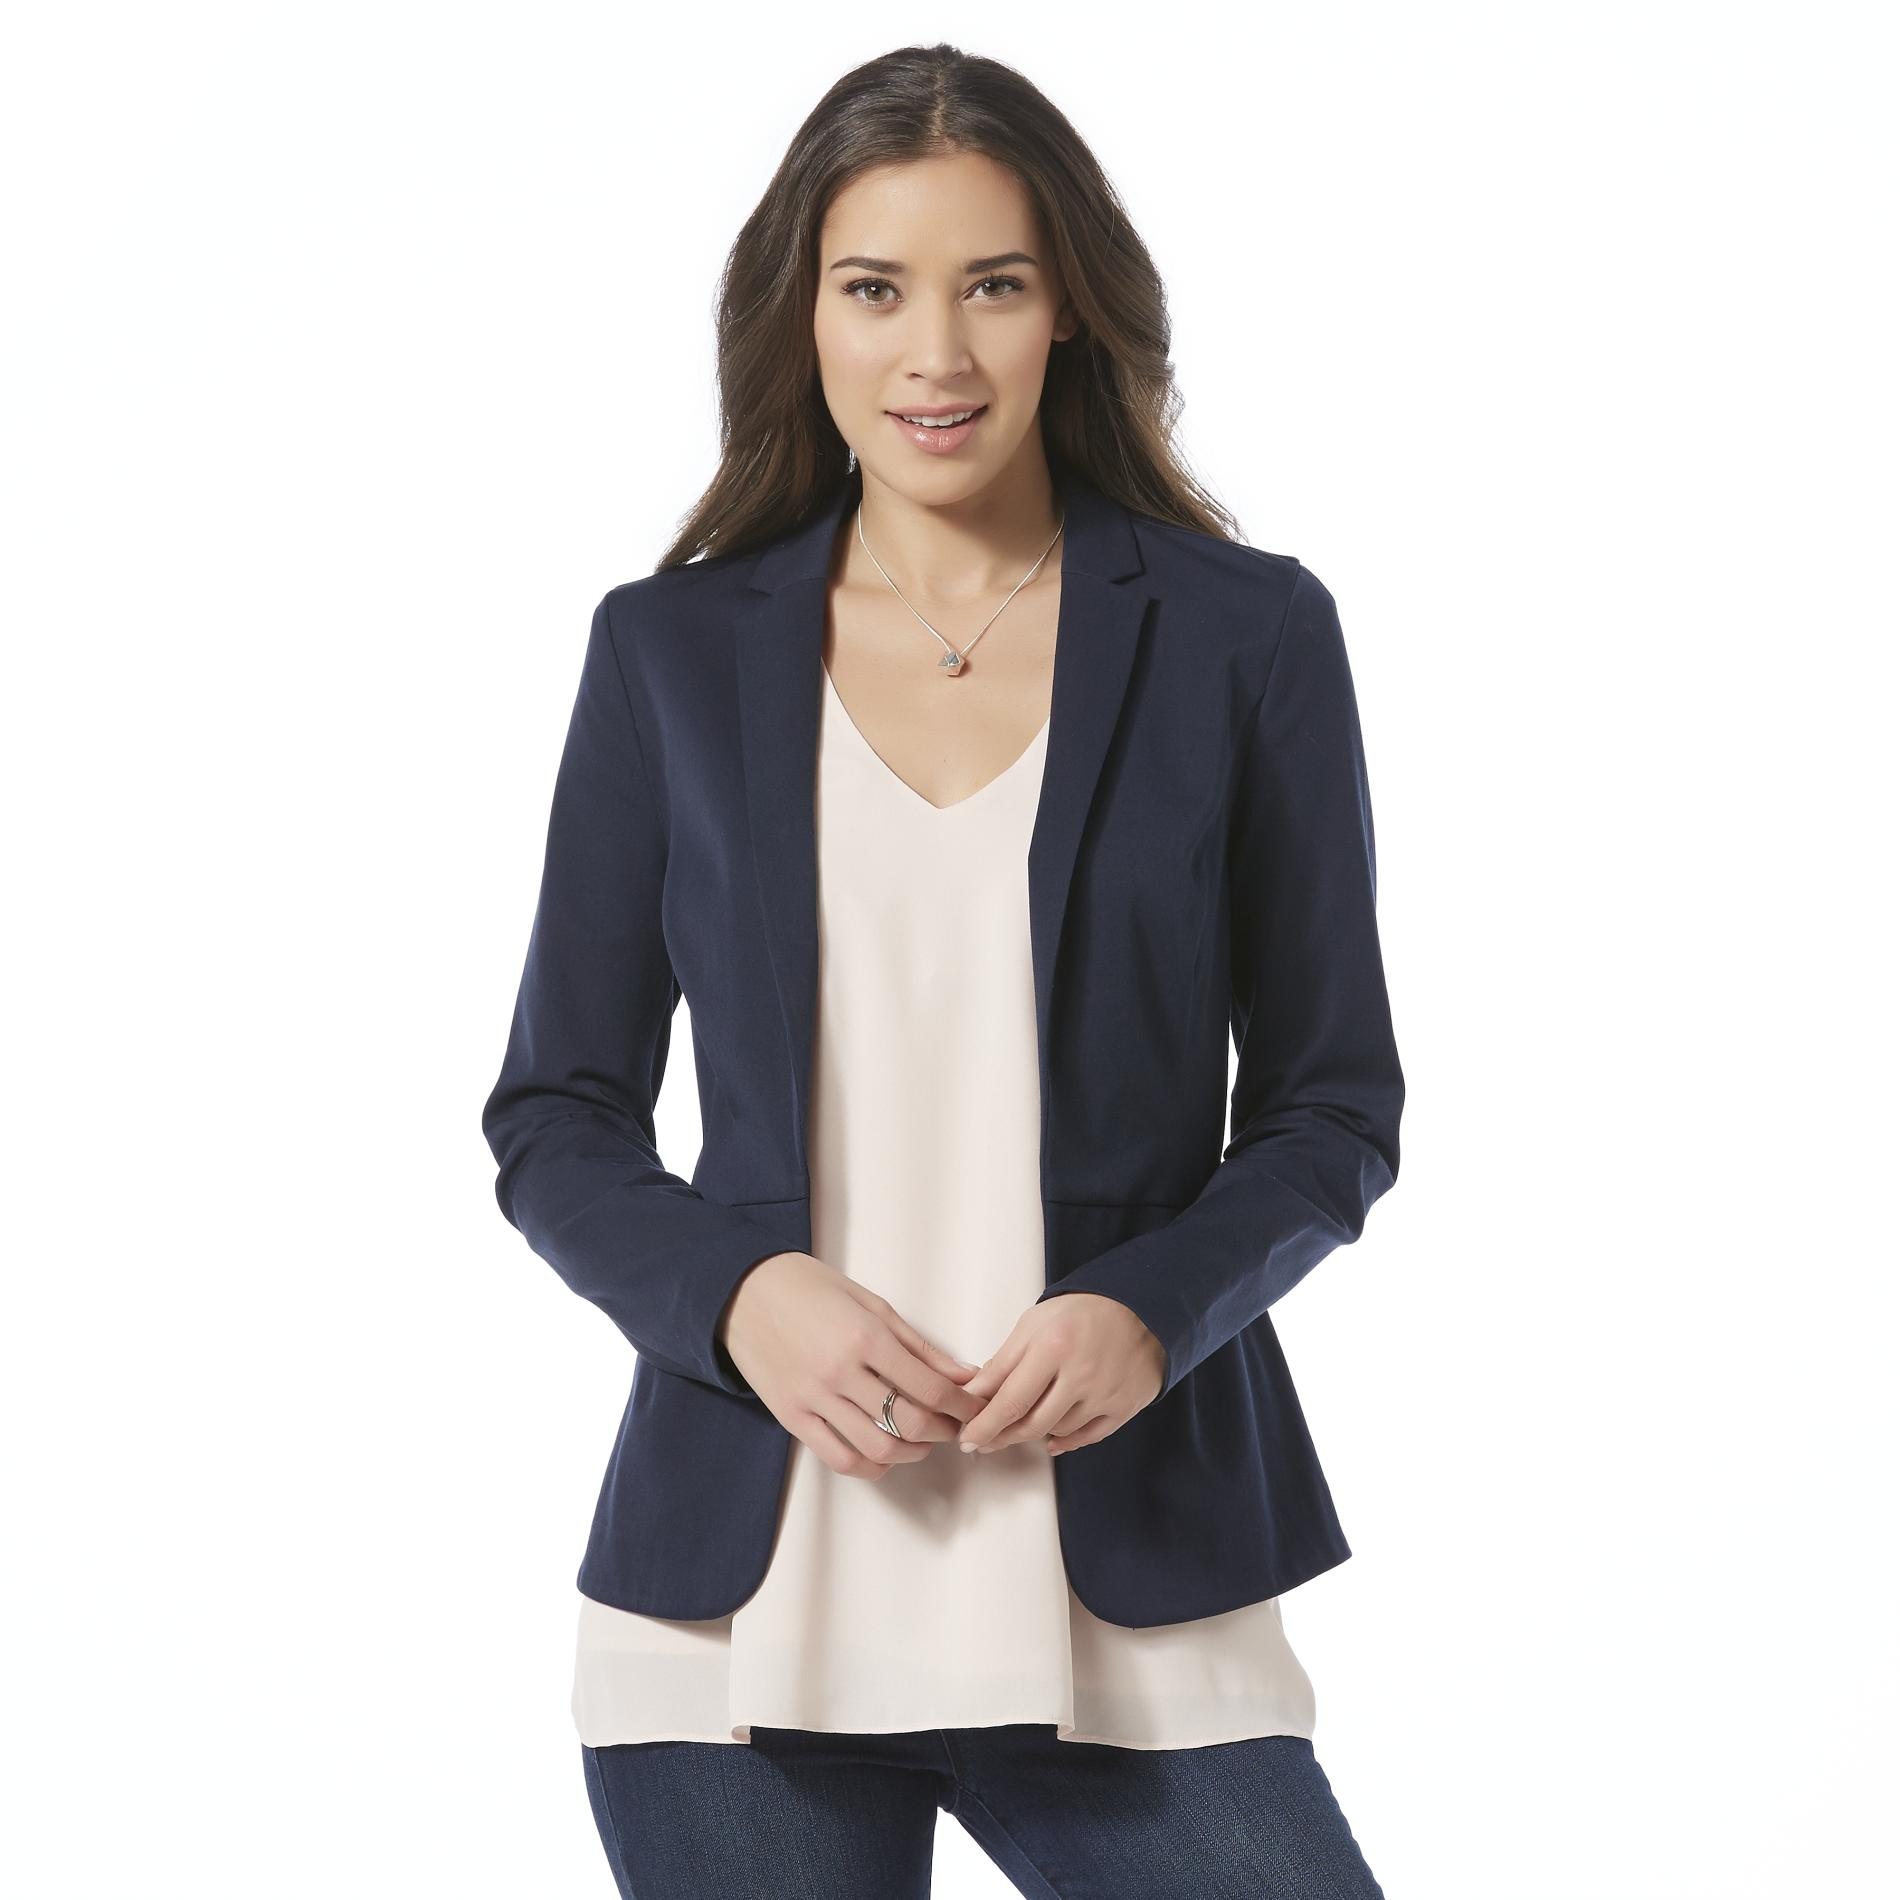 Fashionable women blazers a perfect choice